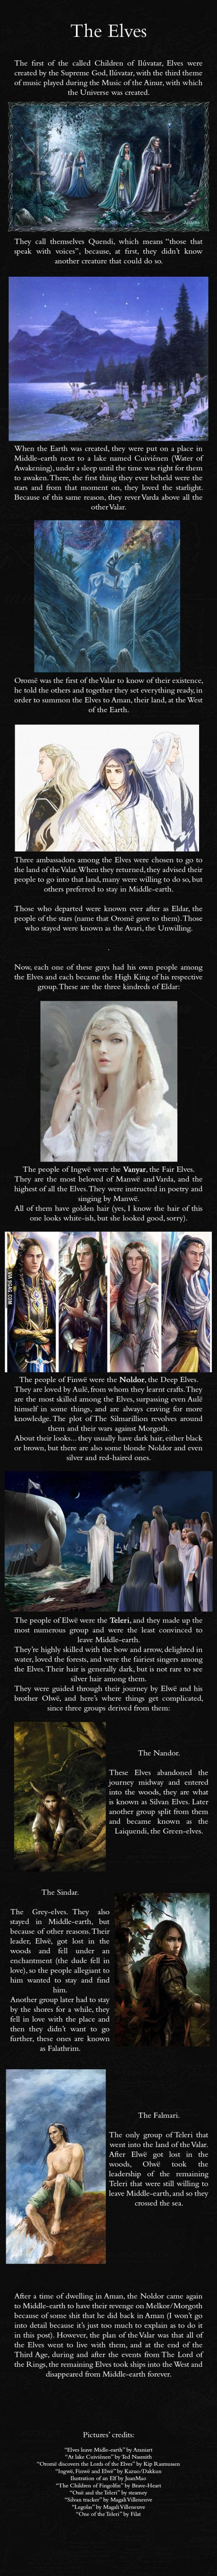 The Elves - J.R.R. Mythology: